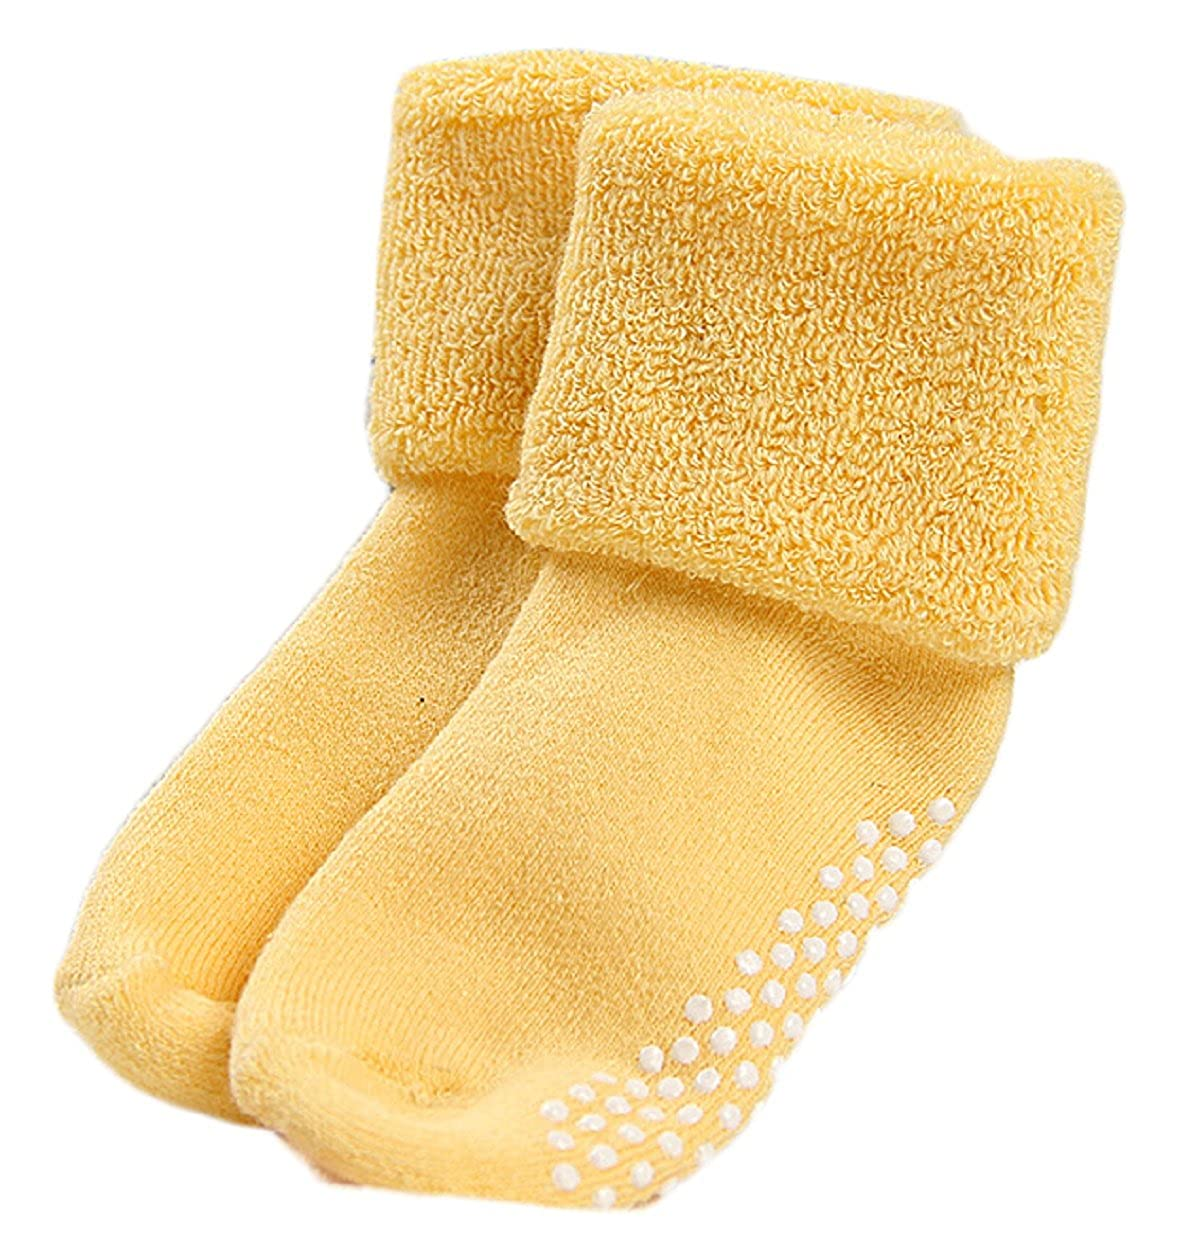 AATMart Unisex Children 6 Pairs Thick Non-Slip Non-Skid Pure Cotton Socks Multi Color